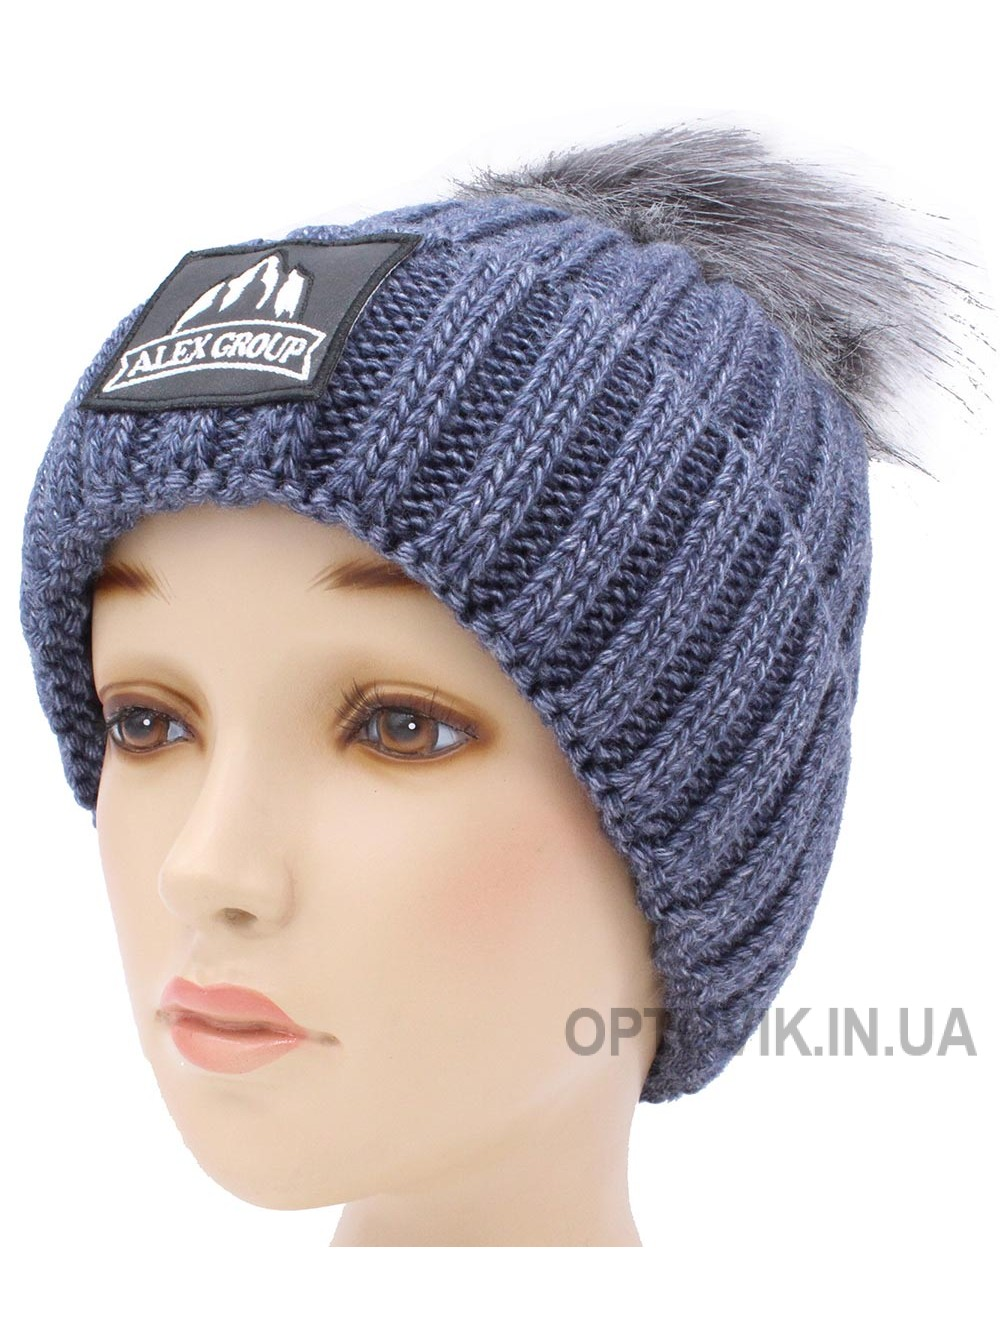 Детская вязаная шапка Майк D55933-50-54